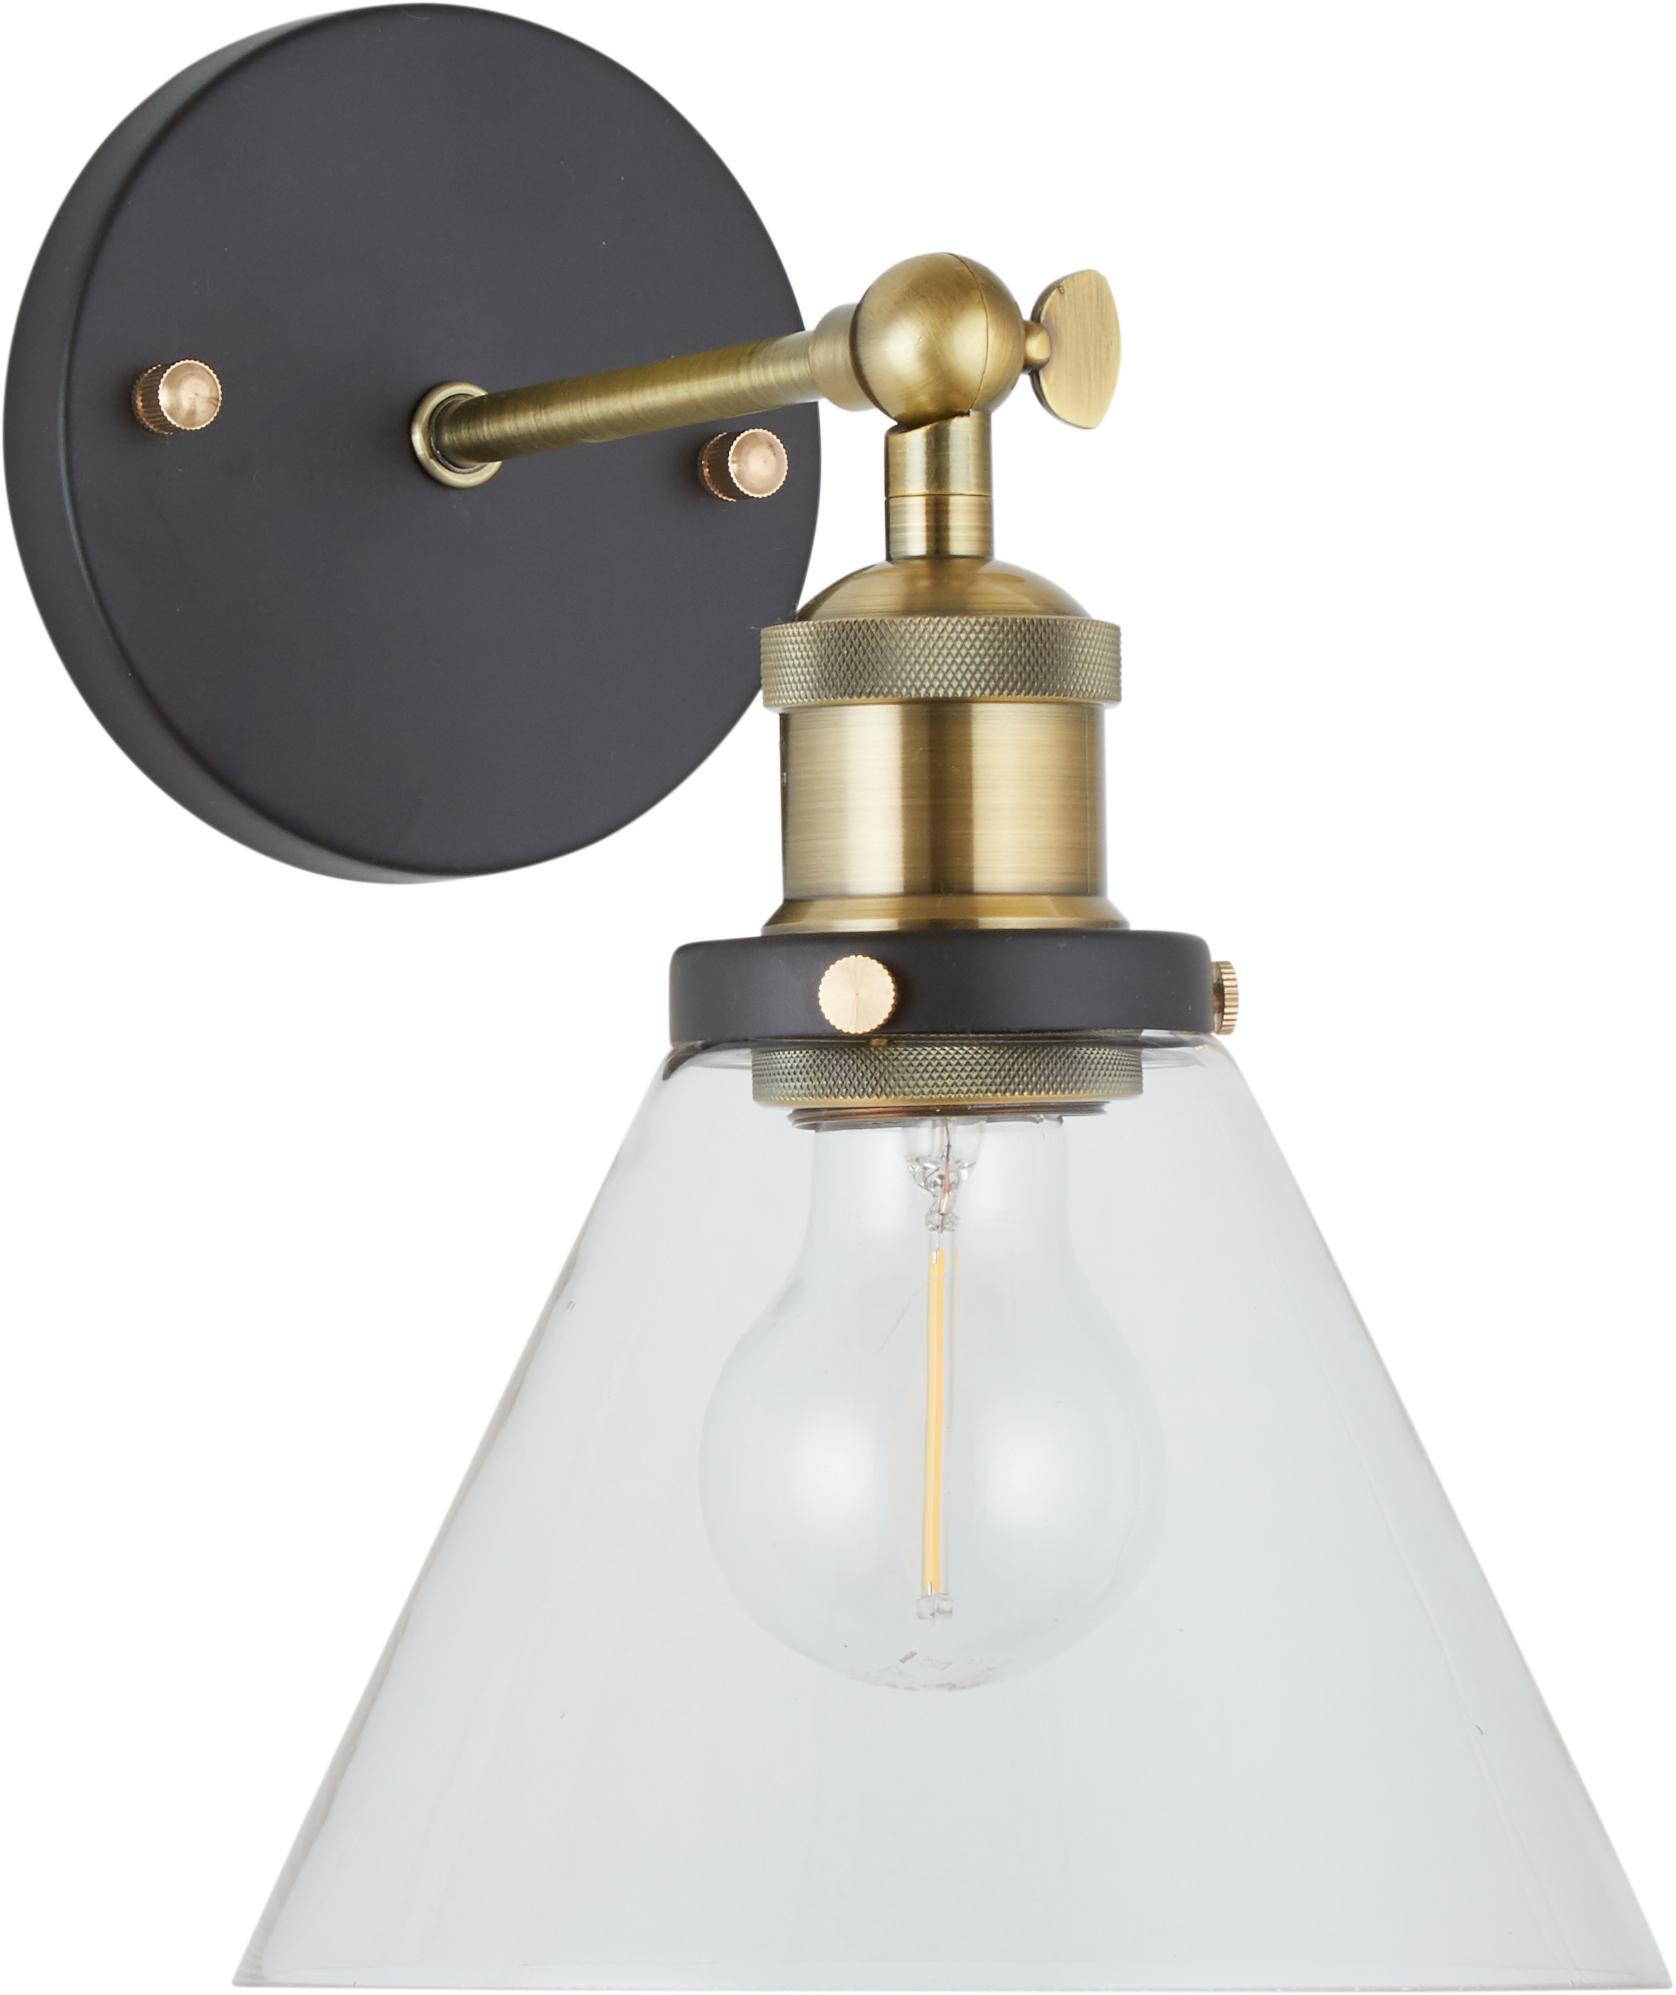 Wandleuchte New York Loft No.1, Baldachin: Metall, pulverbeschichtet, Lampenschirm: Glas, Schwarz, Messing, Transparent, 19 x 29 cm